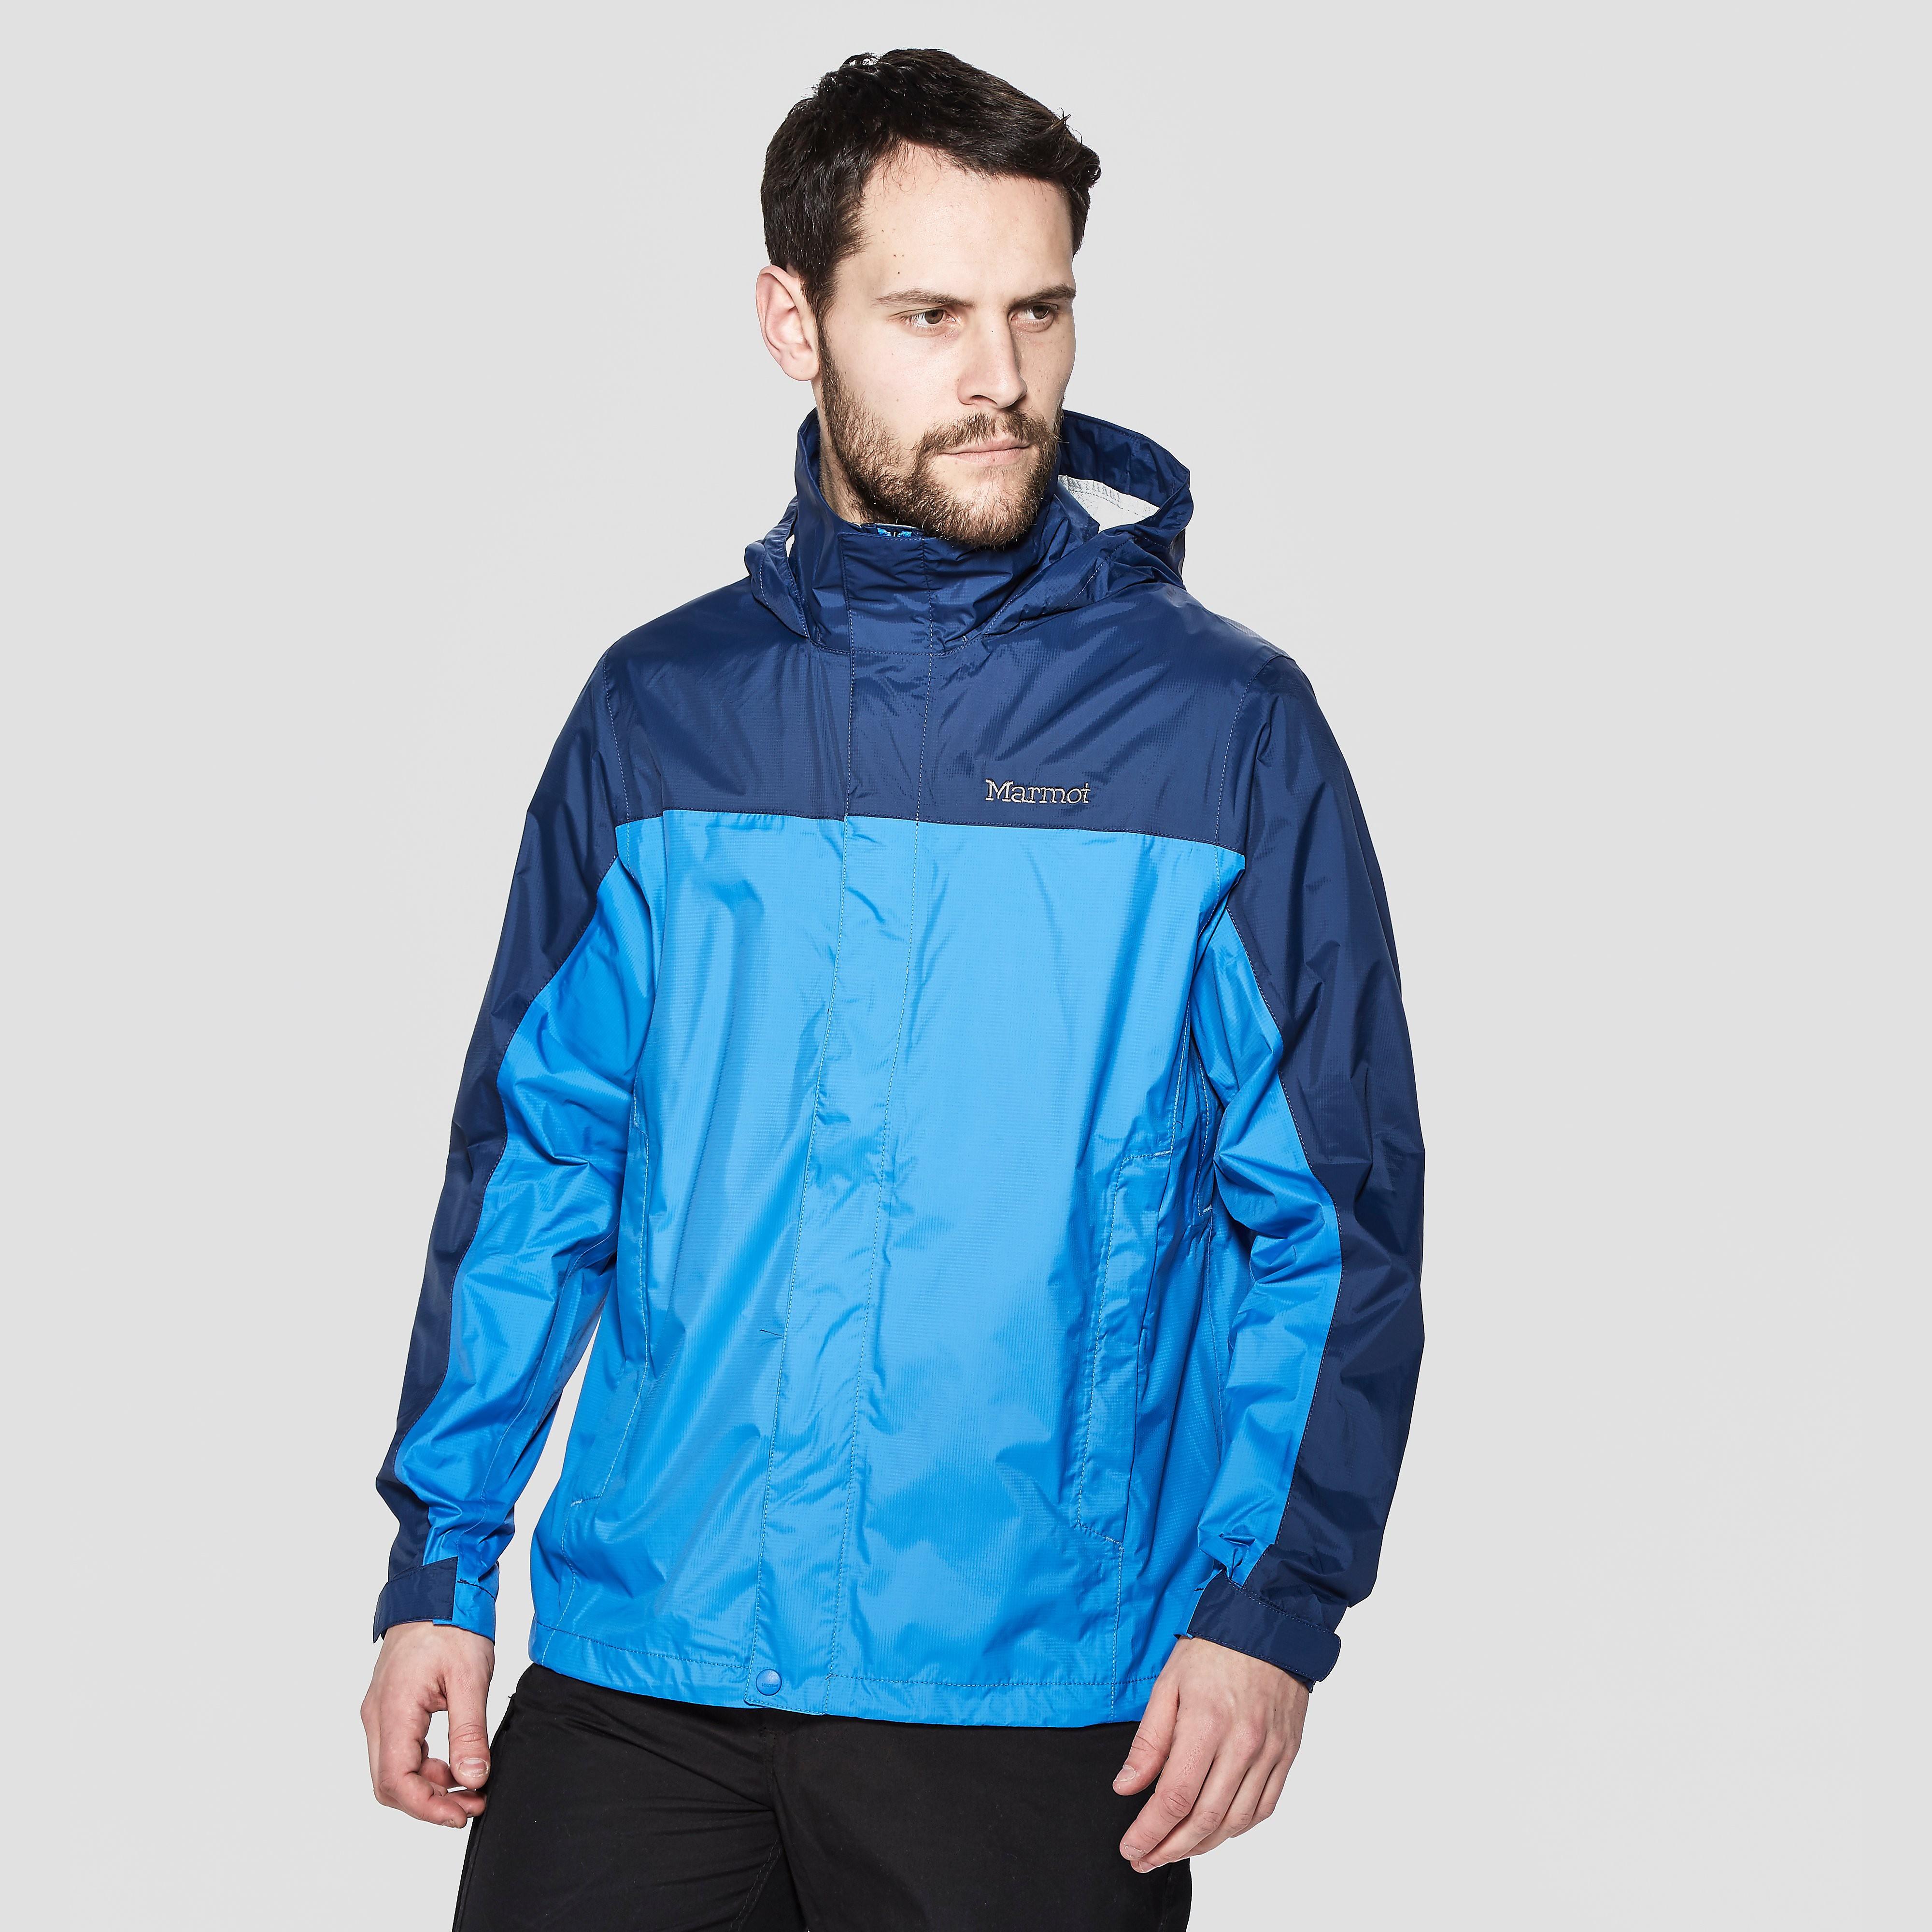 Marmot PreCip Men's Jacket